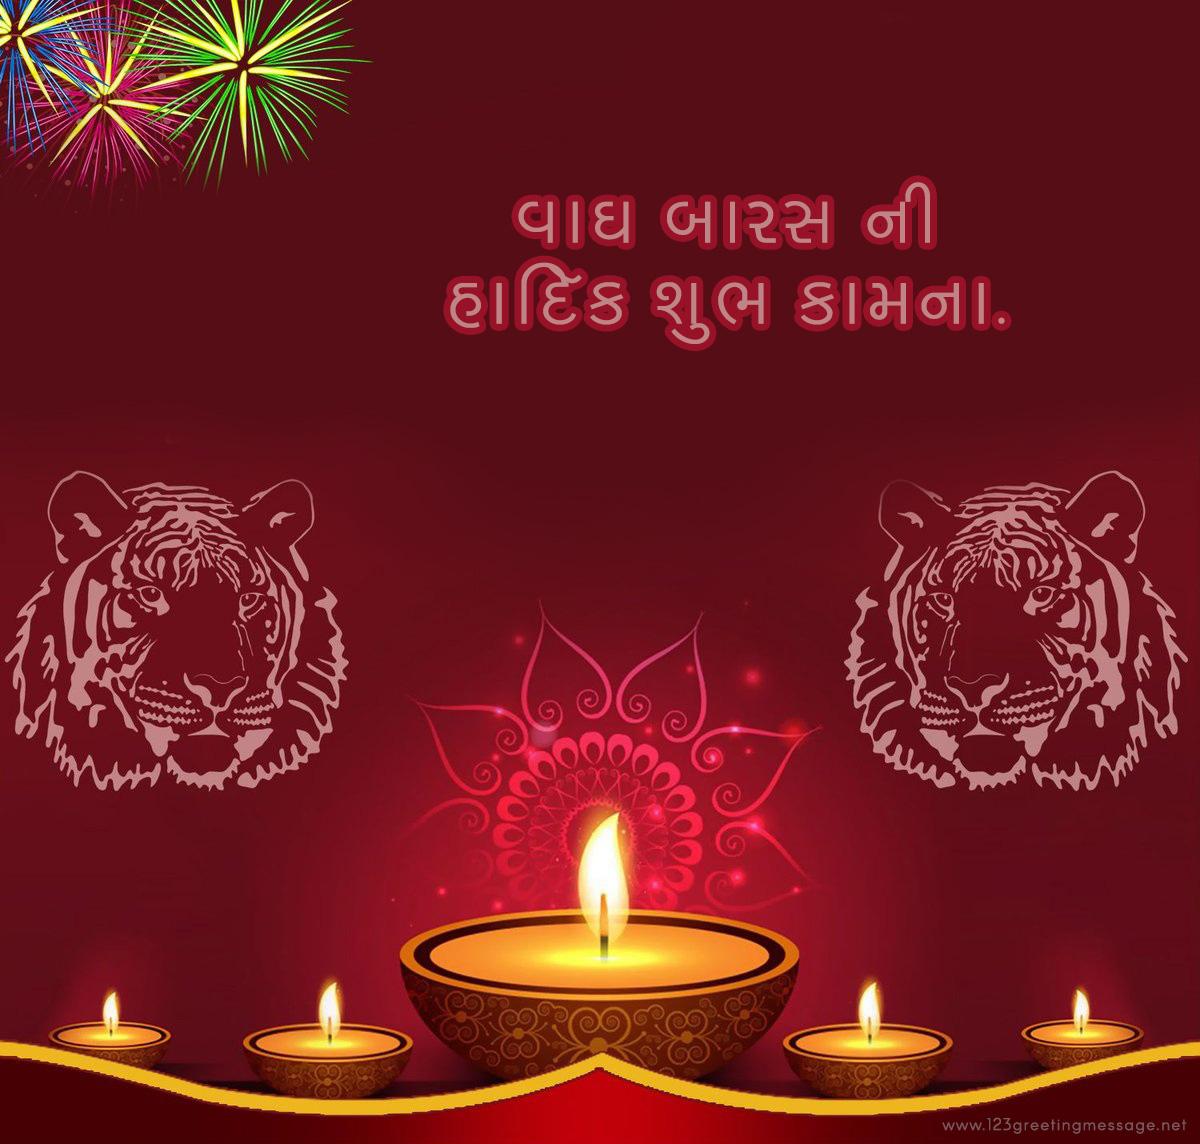 Happy Vagh Baras Images